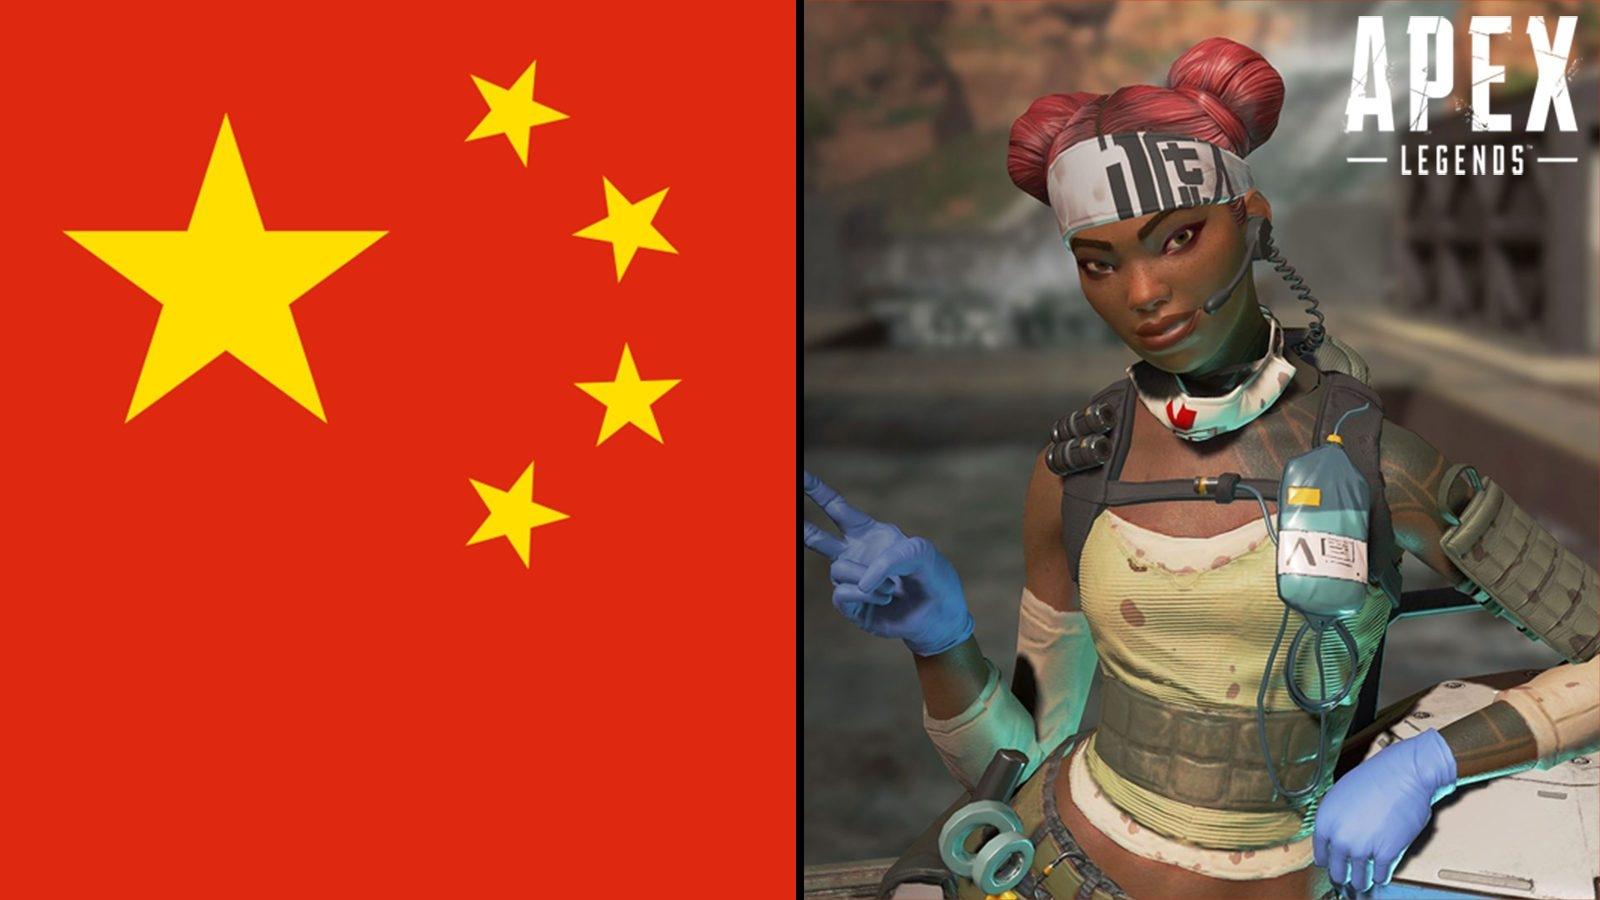 /home/gameworl/public_html/media/kunena/attachments/39080/apex-legends-china-75-1550259342.jpg